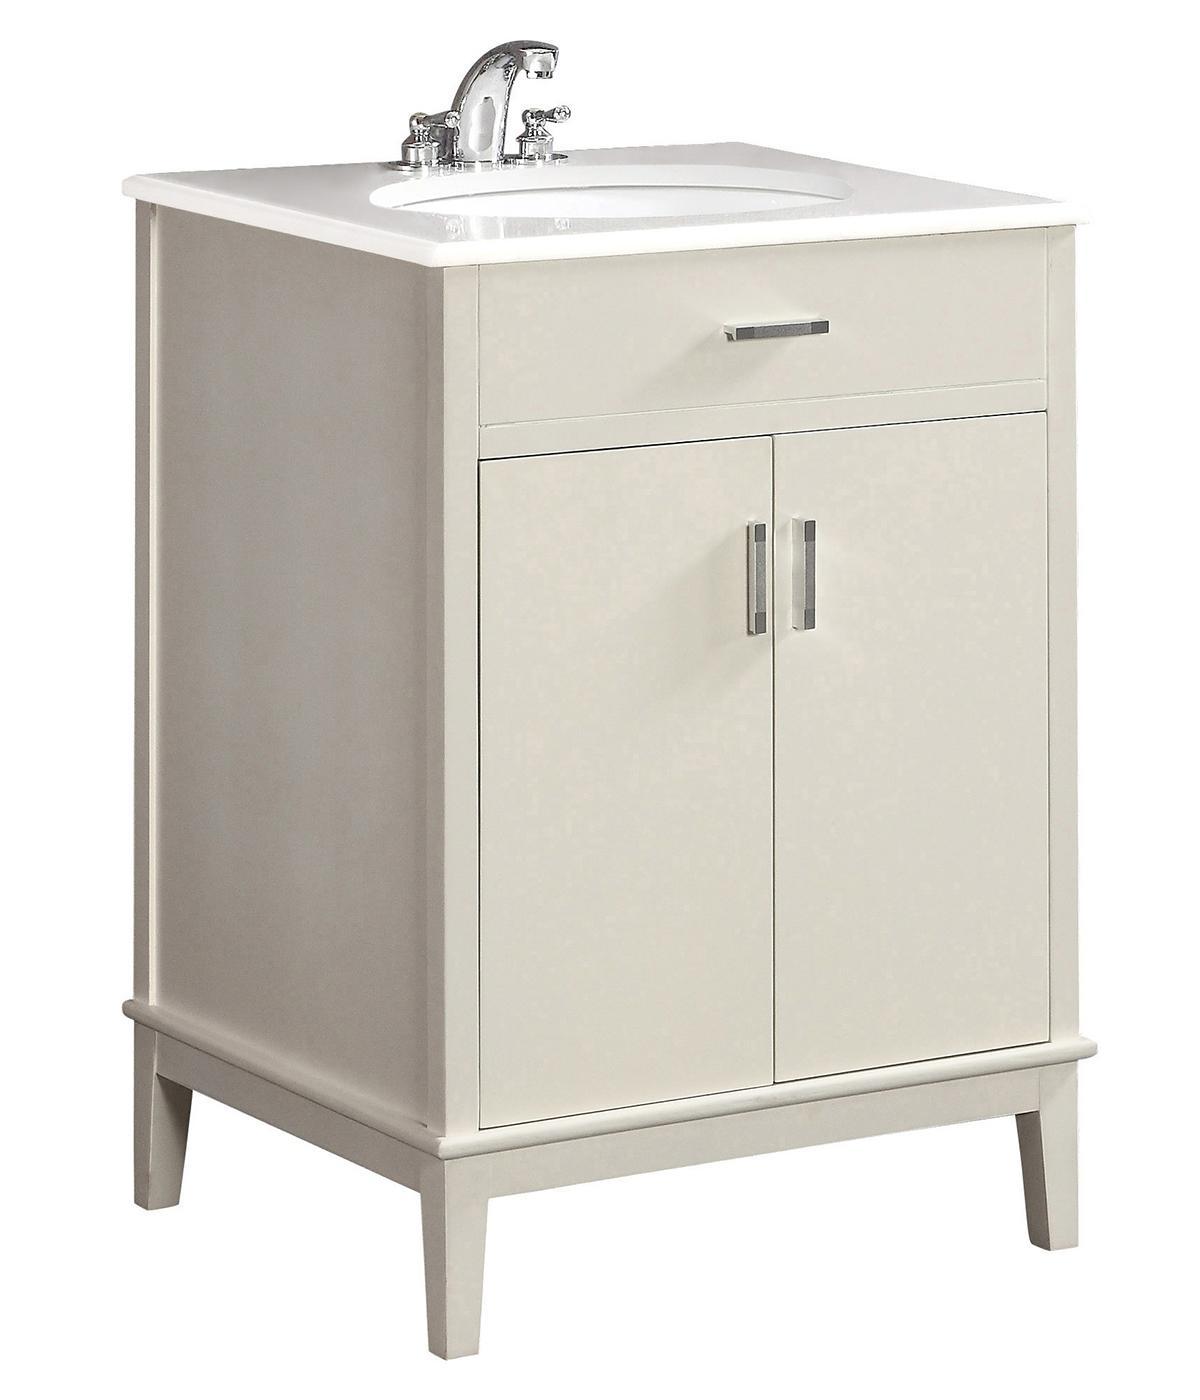 urban loft 24 bath vanity with quartz marble top. Black Bedroom Furniture Sets. Home Design Ideas